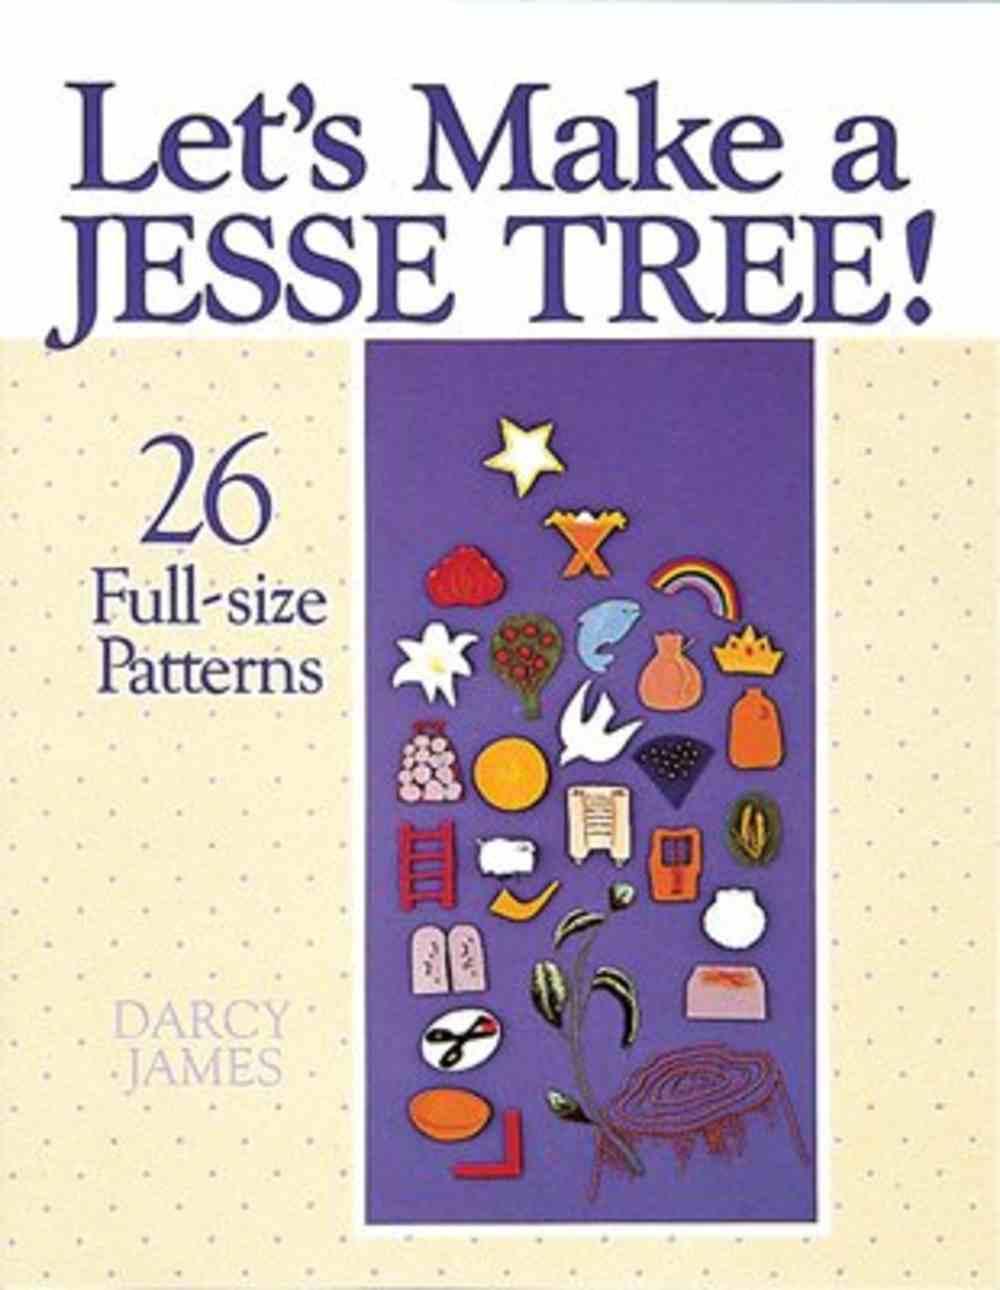 Let's Make a Jesse Tree! Paperback